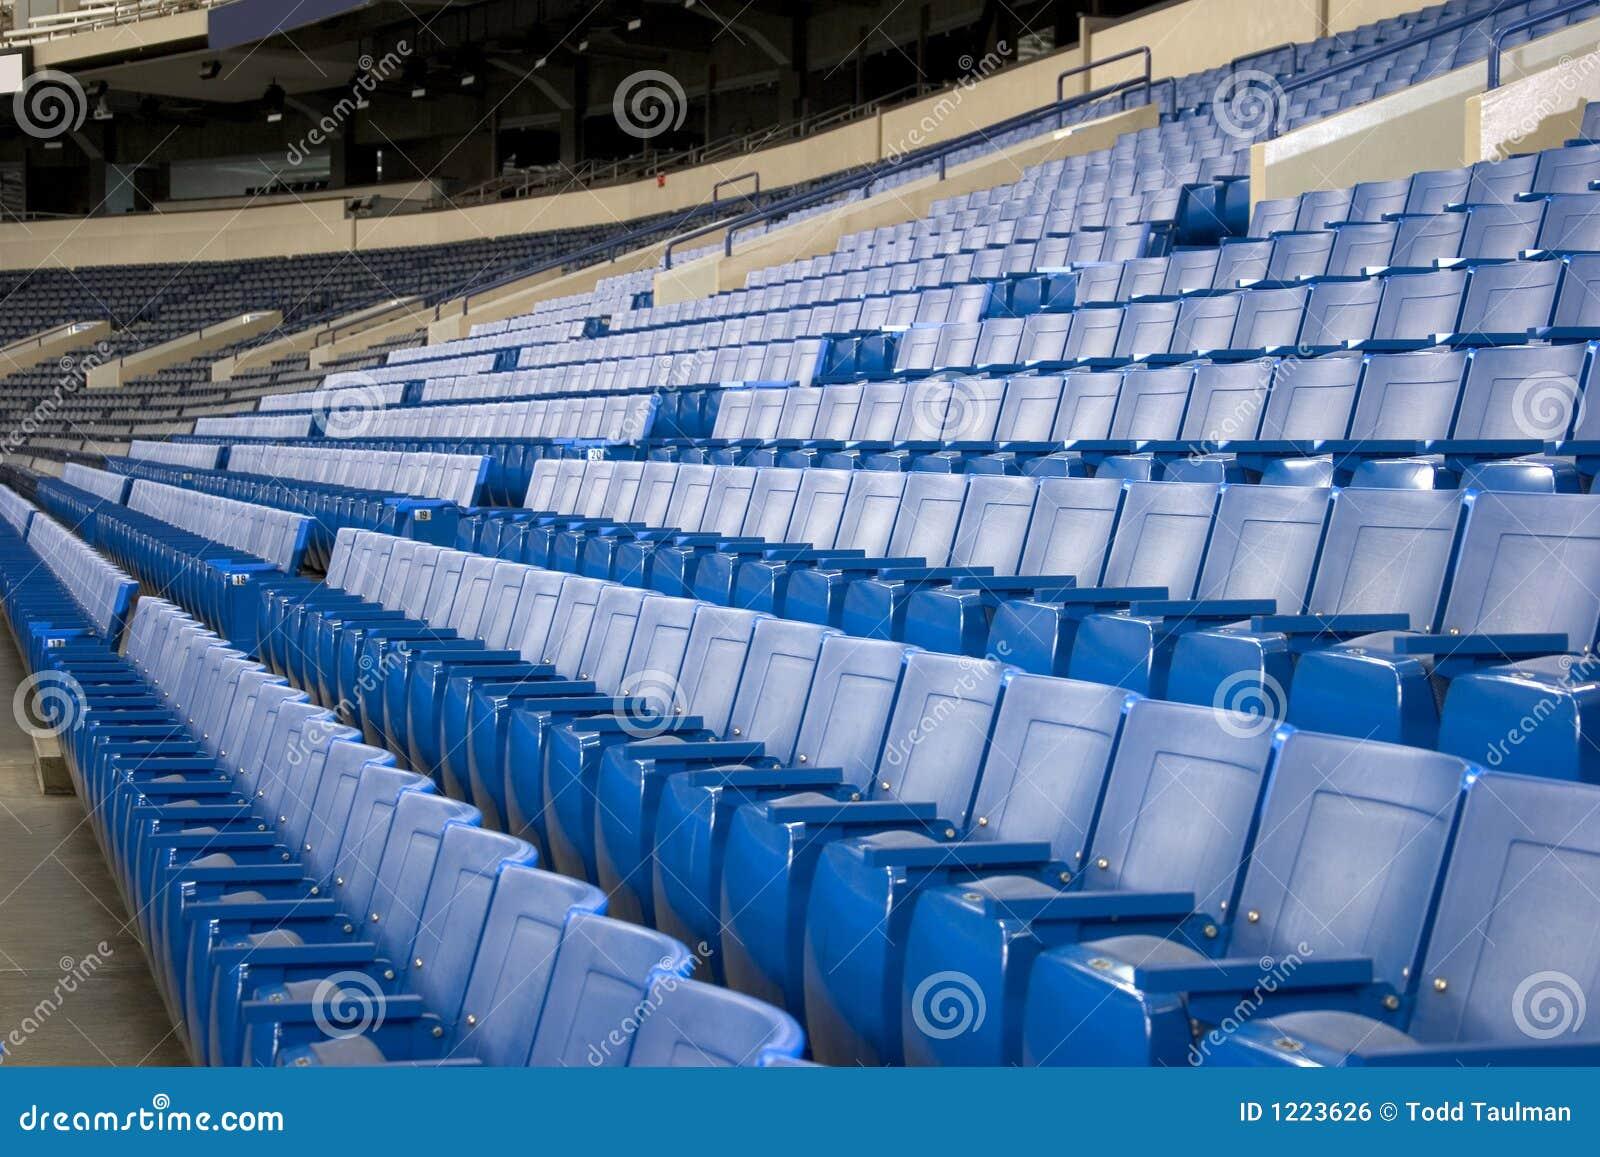 Stadium Seats Stock Photo Image Of Event Plastic